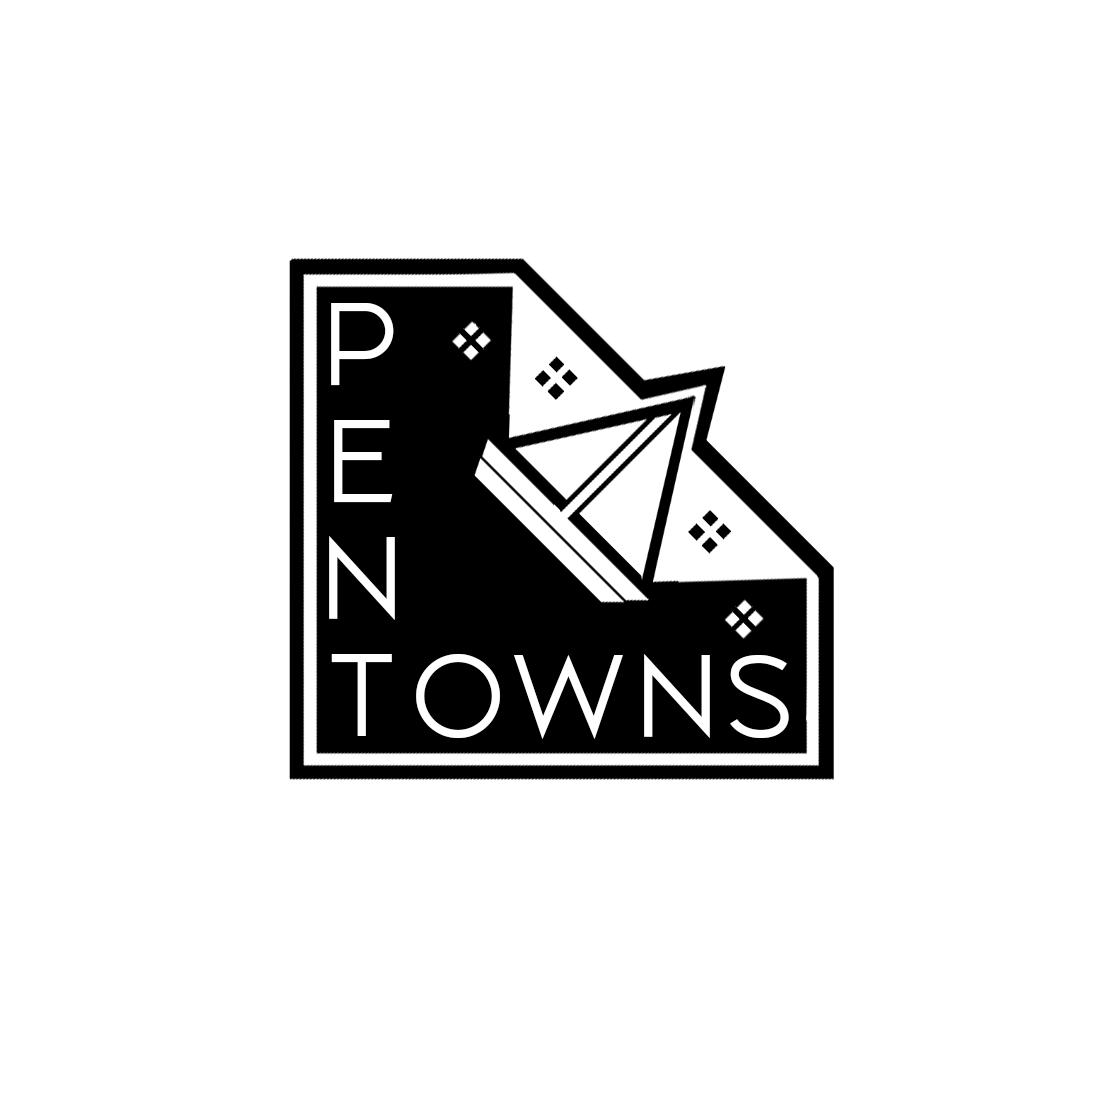 Pent Towns